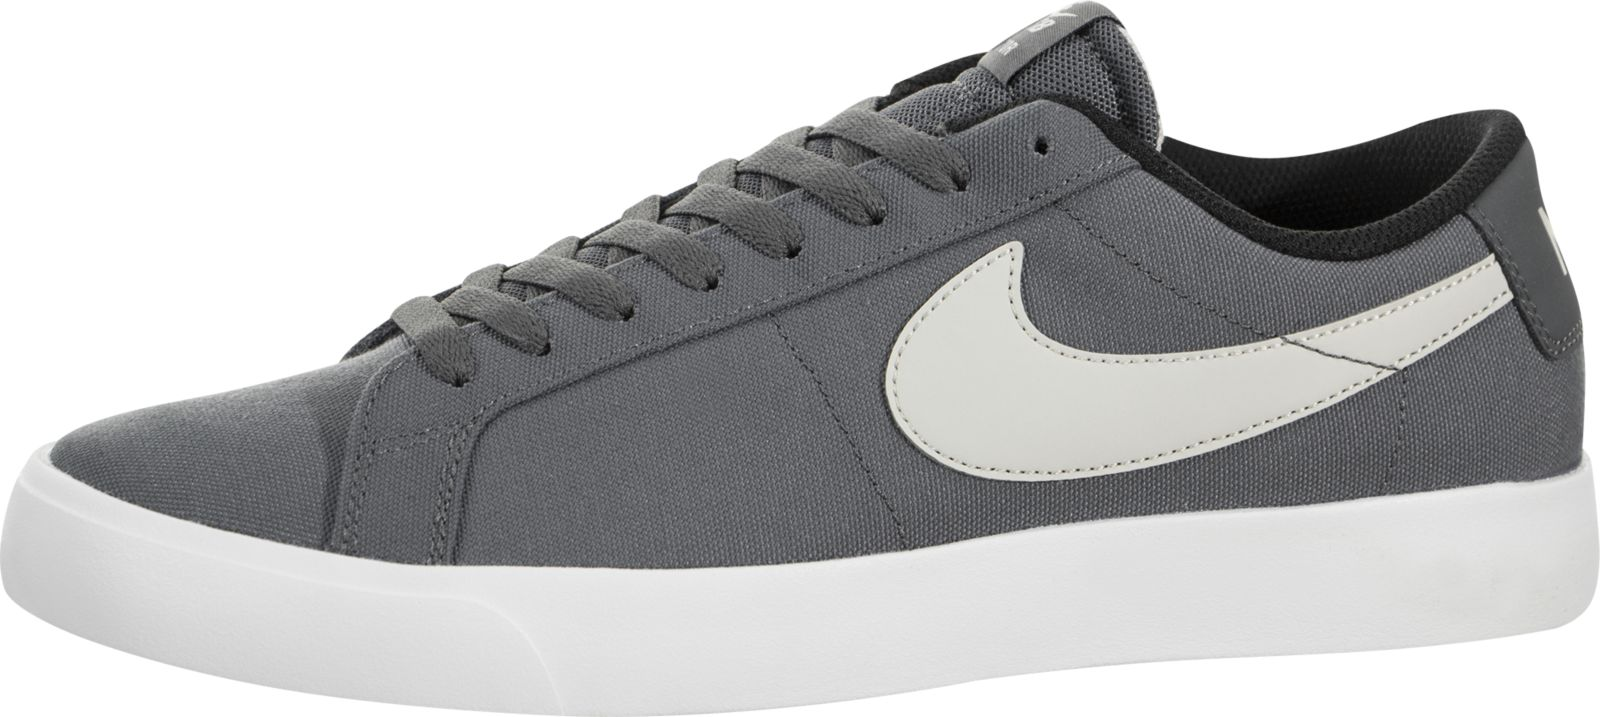 Nike sb blazer vapore txt grigio scuro / luce ossa